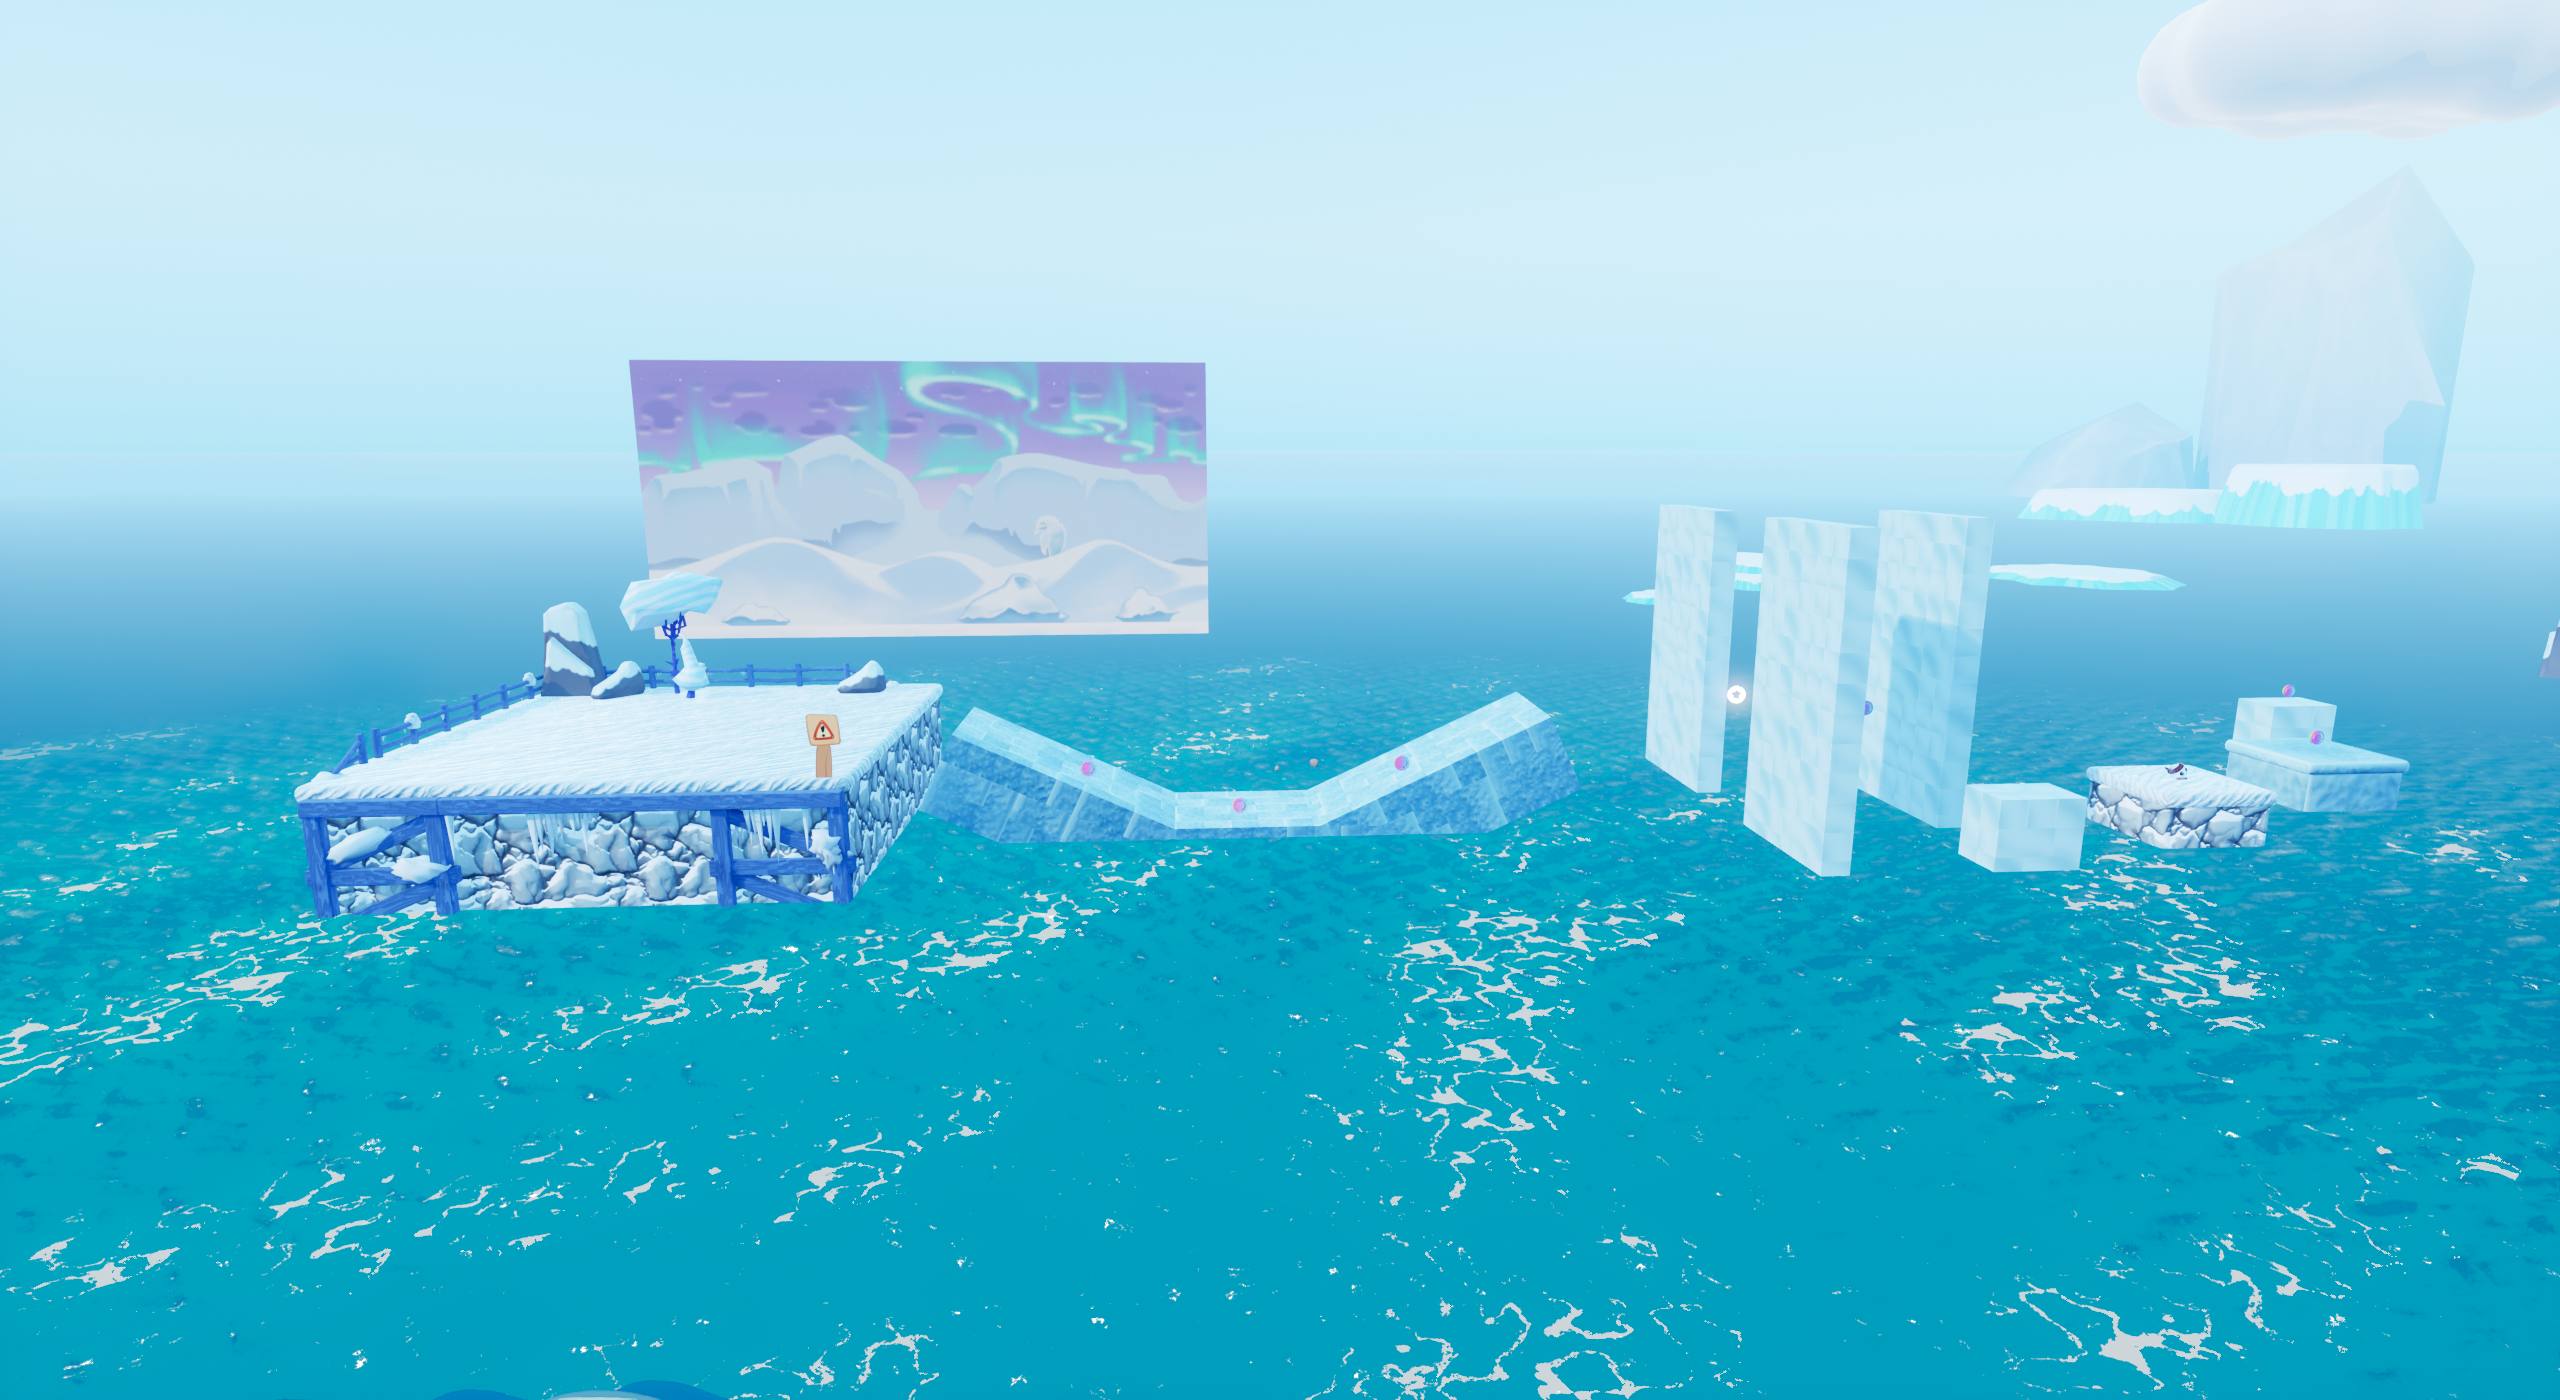 IceLevel05